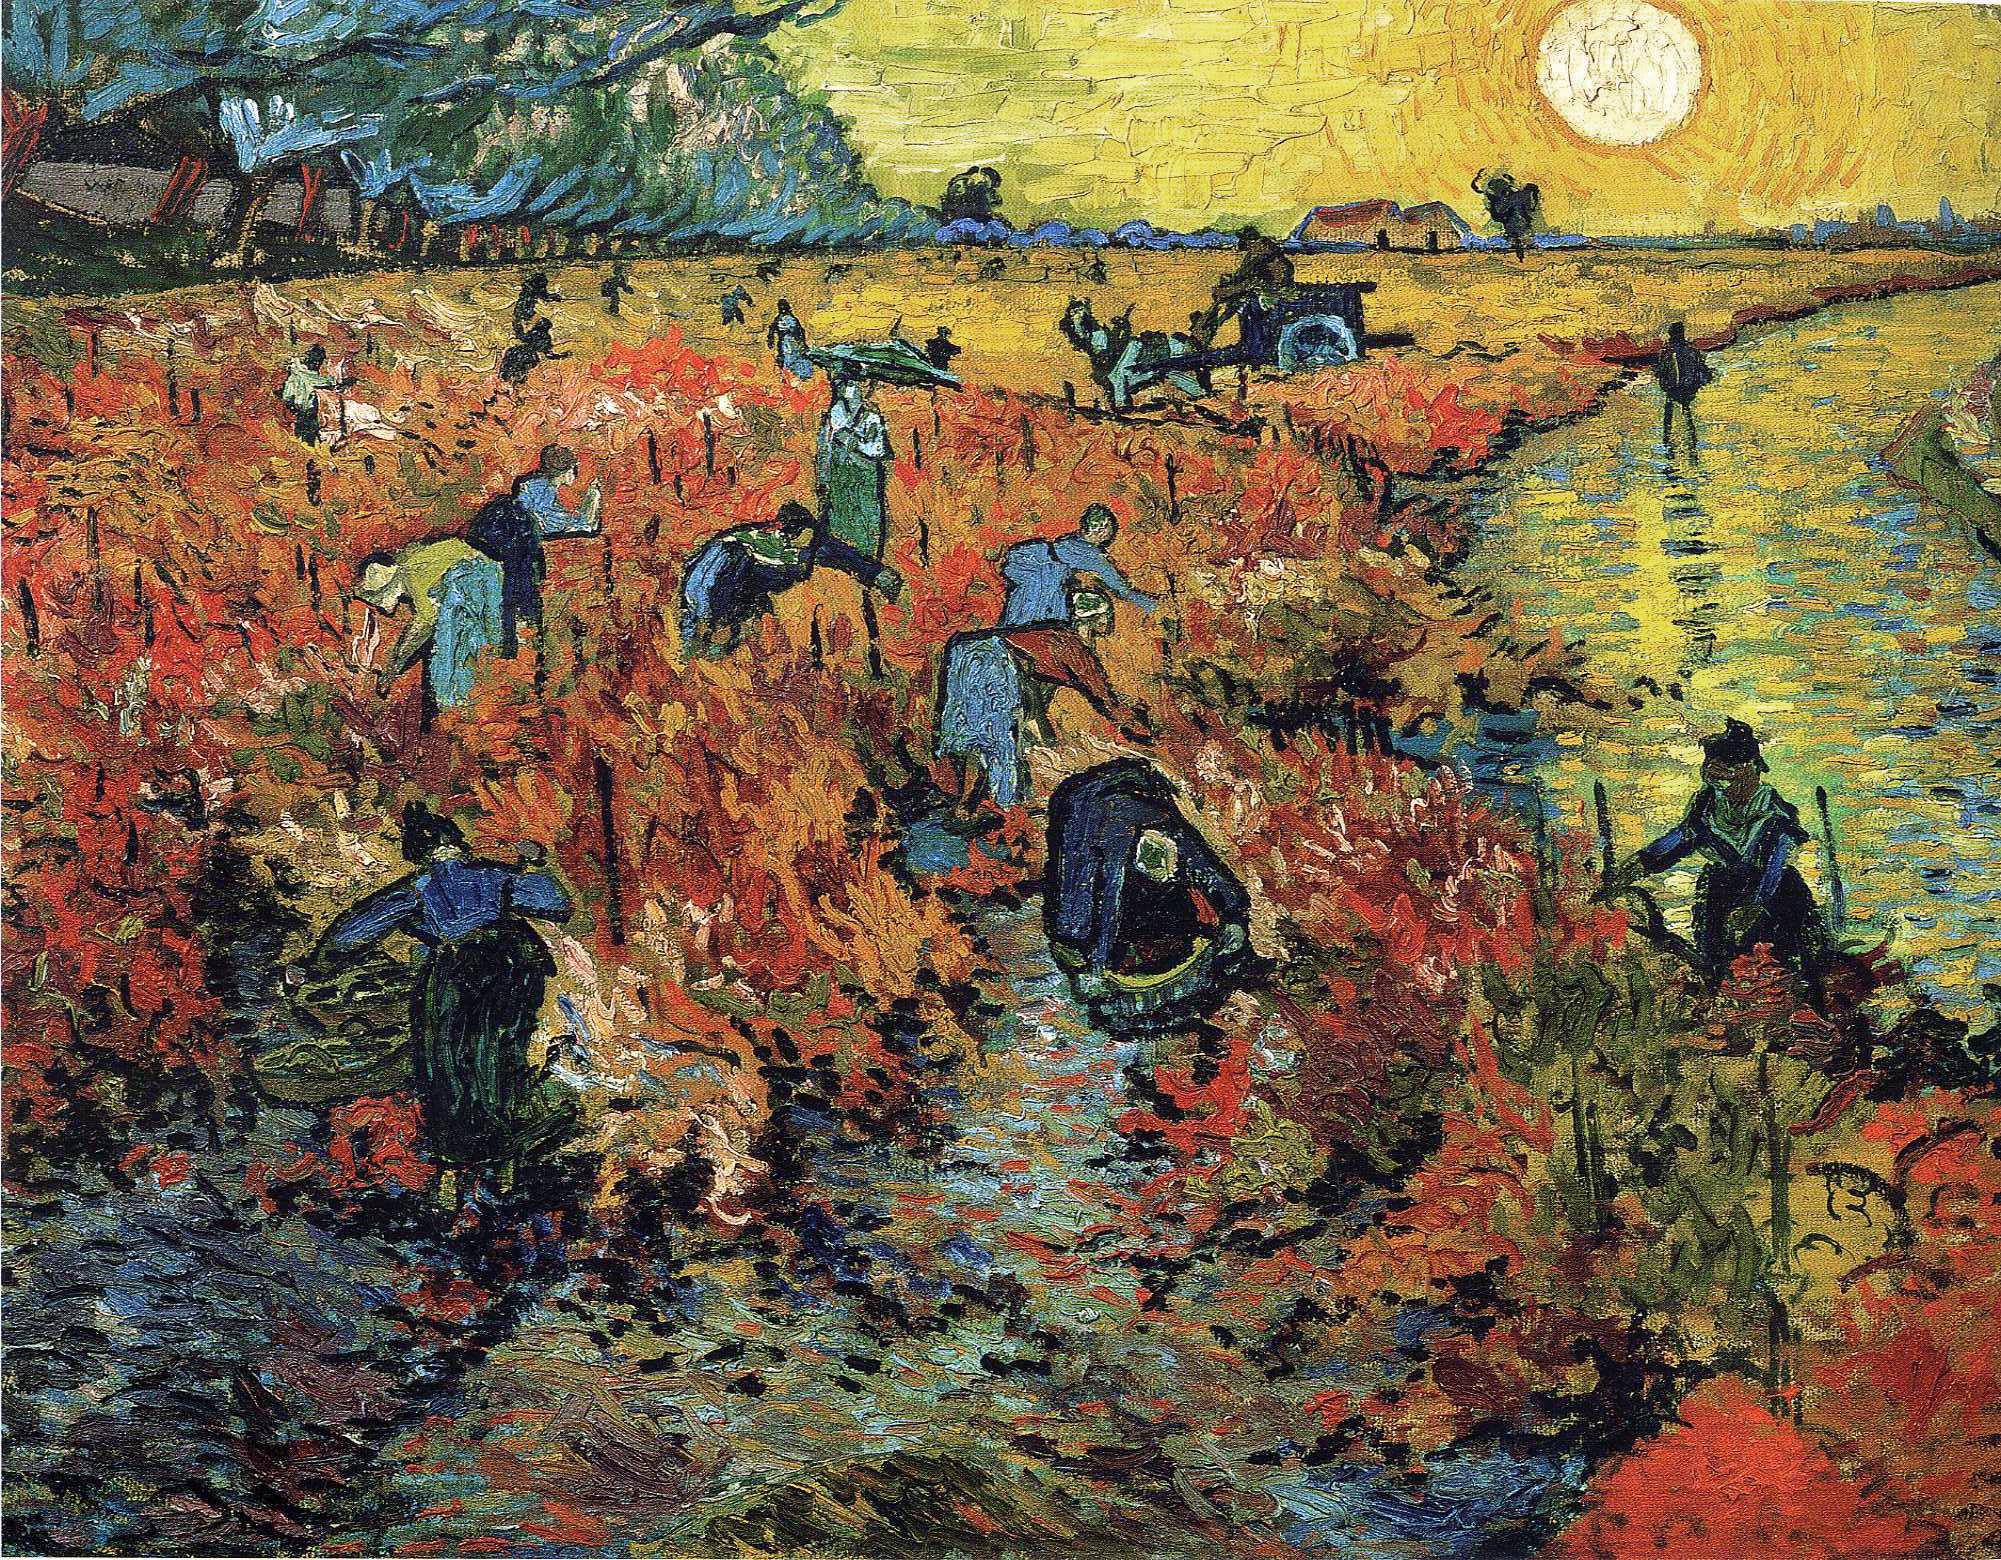 https://upload.wikimedia.org/wikipedia/commons/3/35/Red_vineyards.jpg